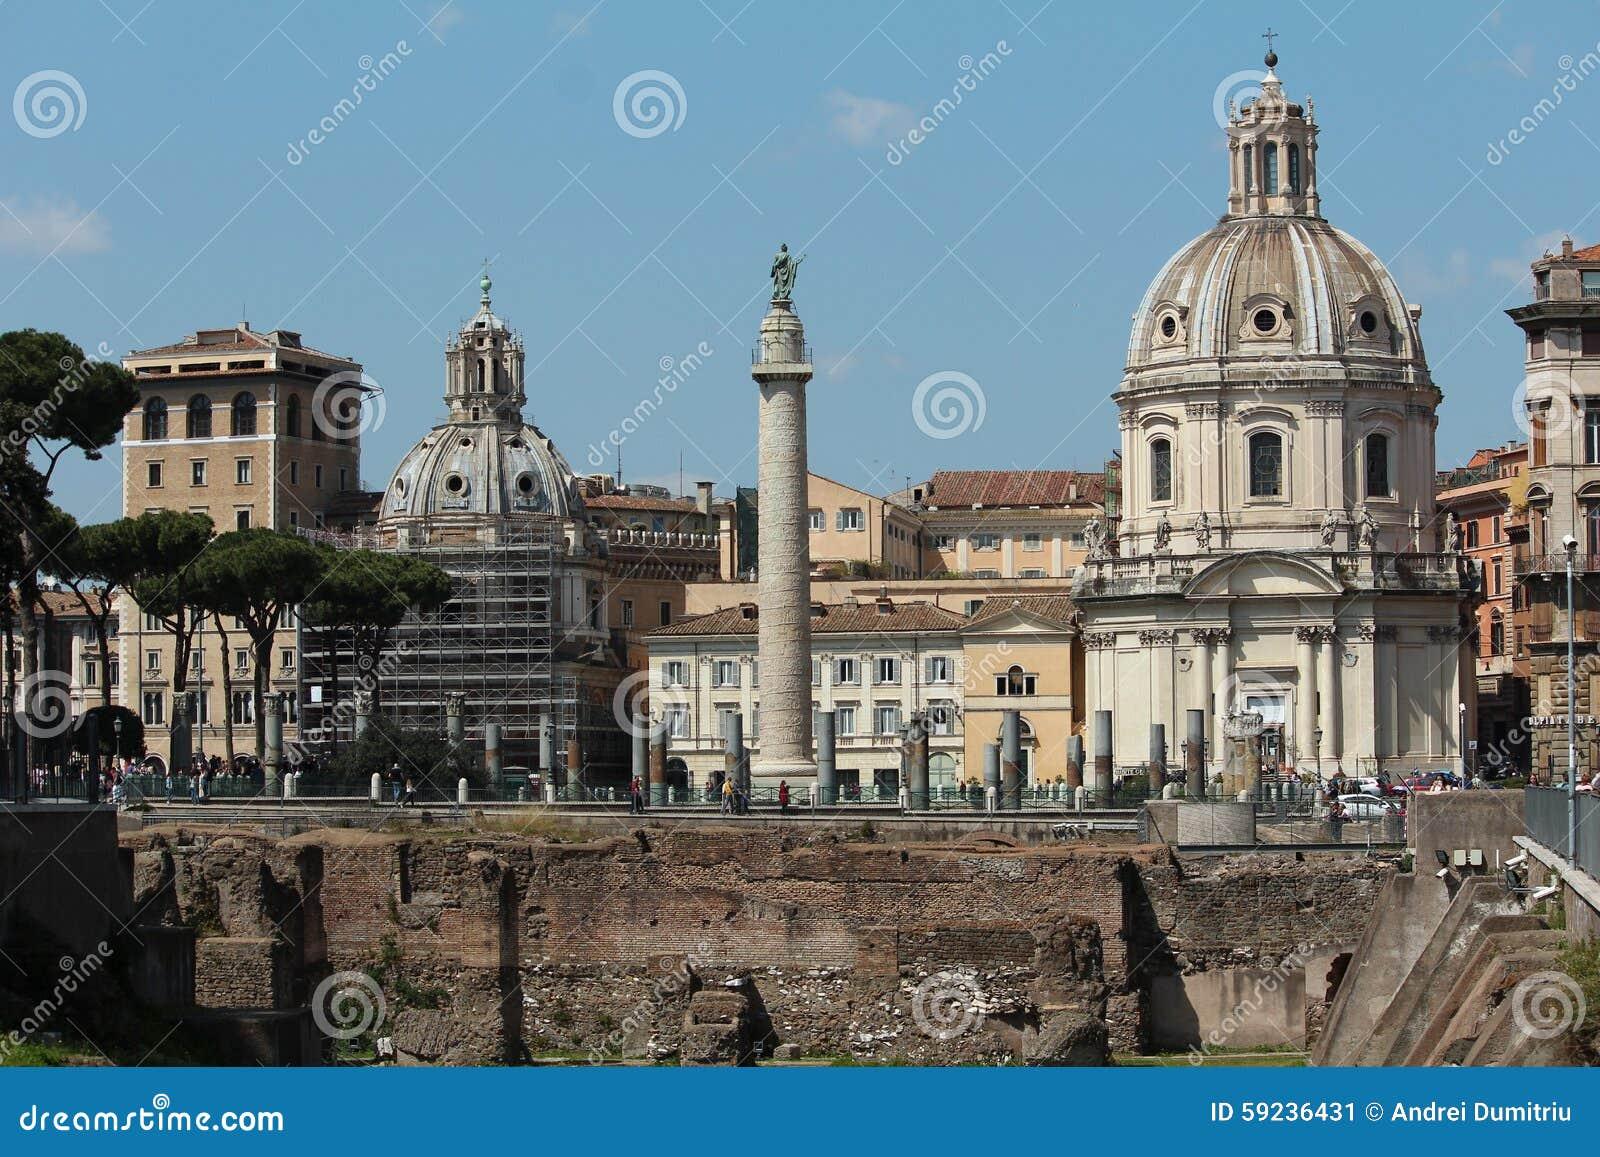 La columna de Trajan con paisaje italiano